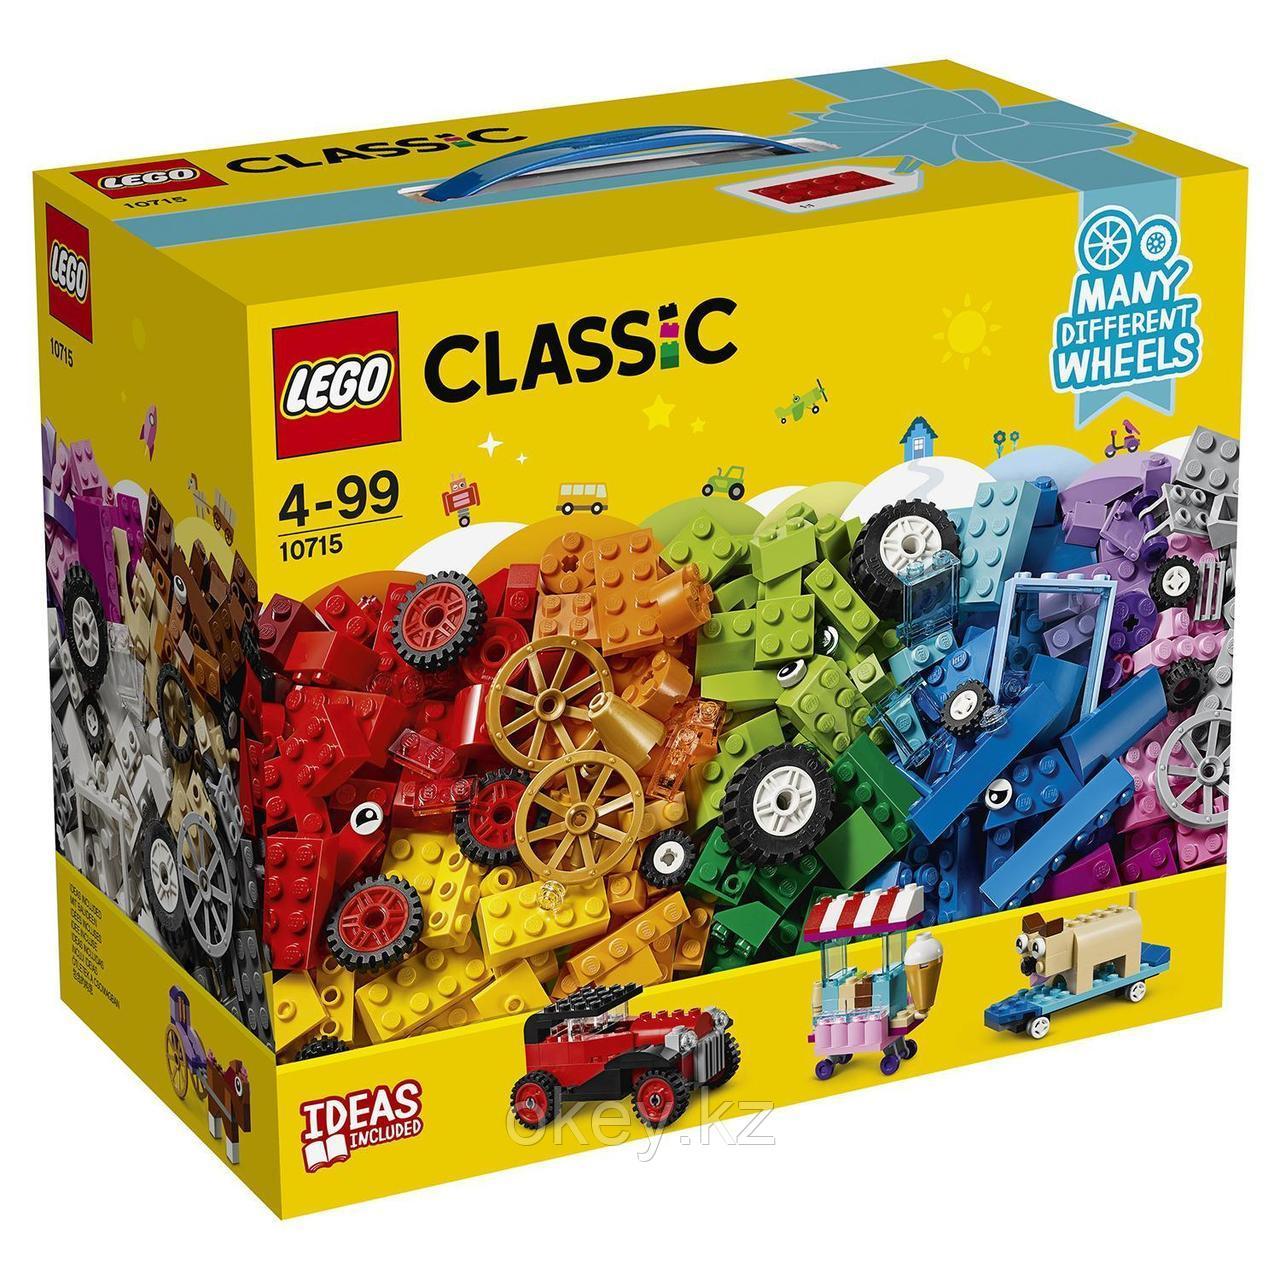 LEGO Classic: Модели на колёсах 10715